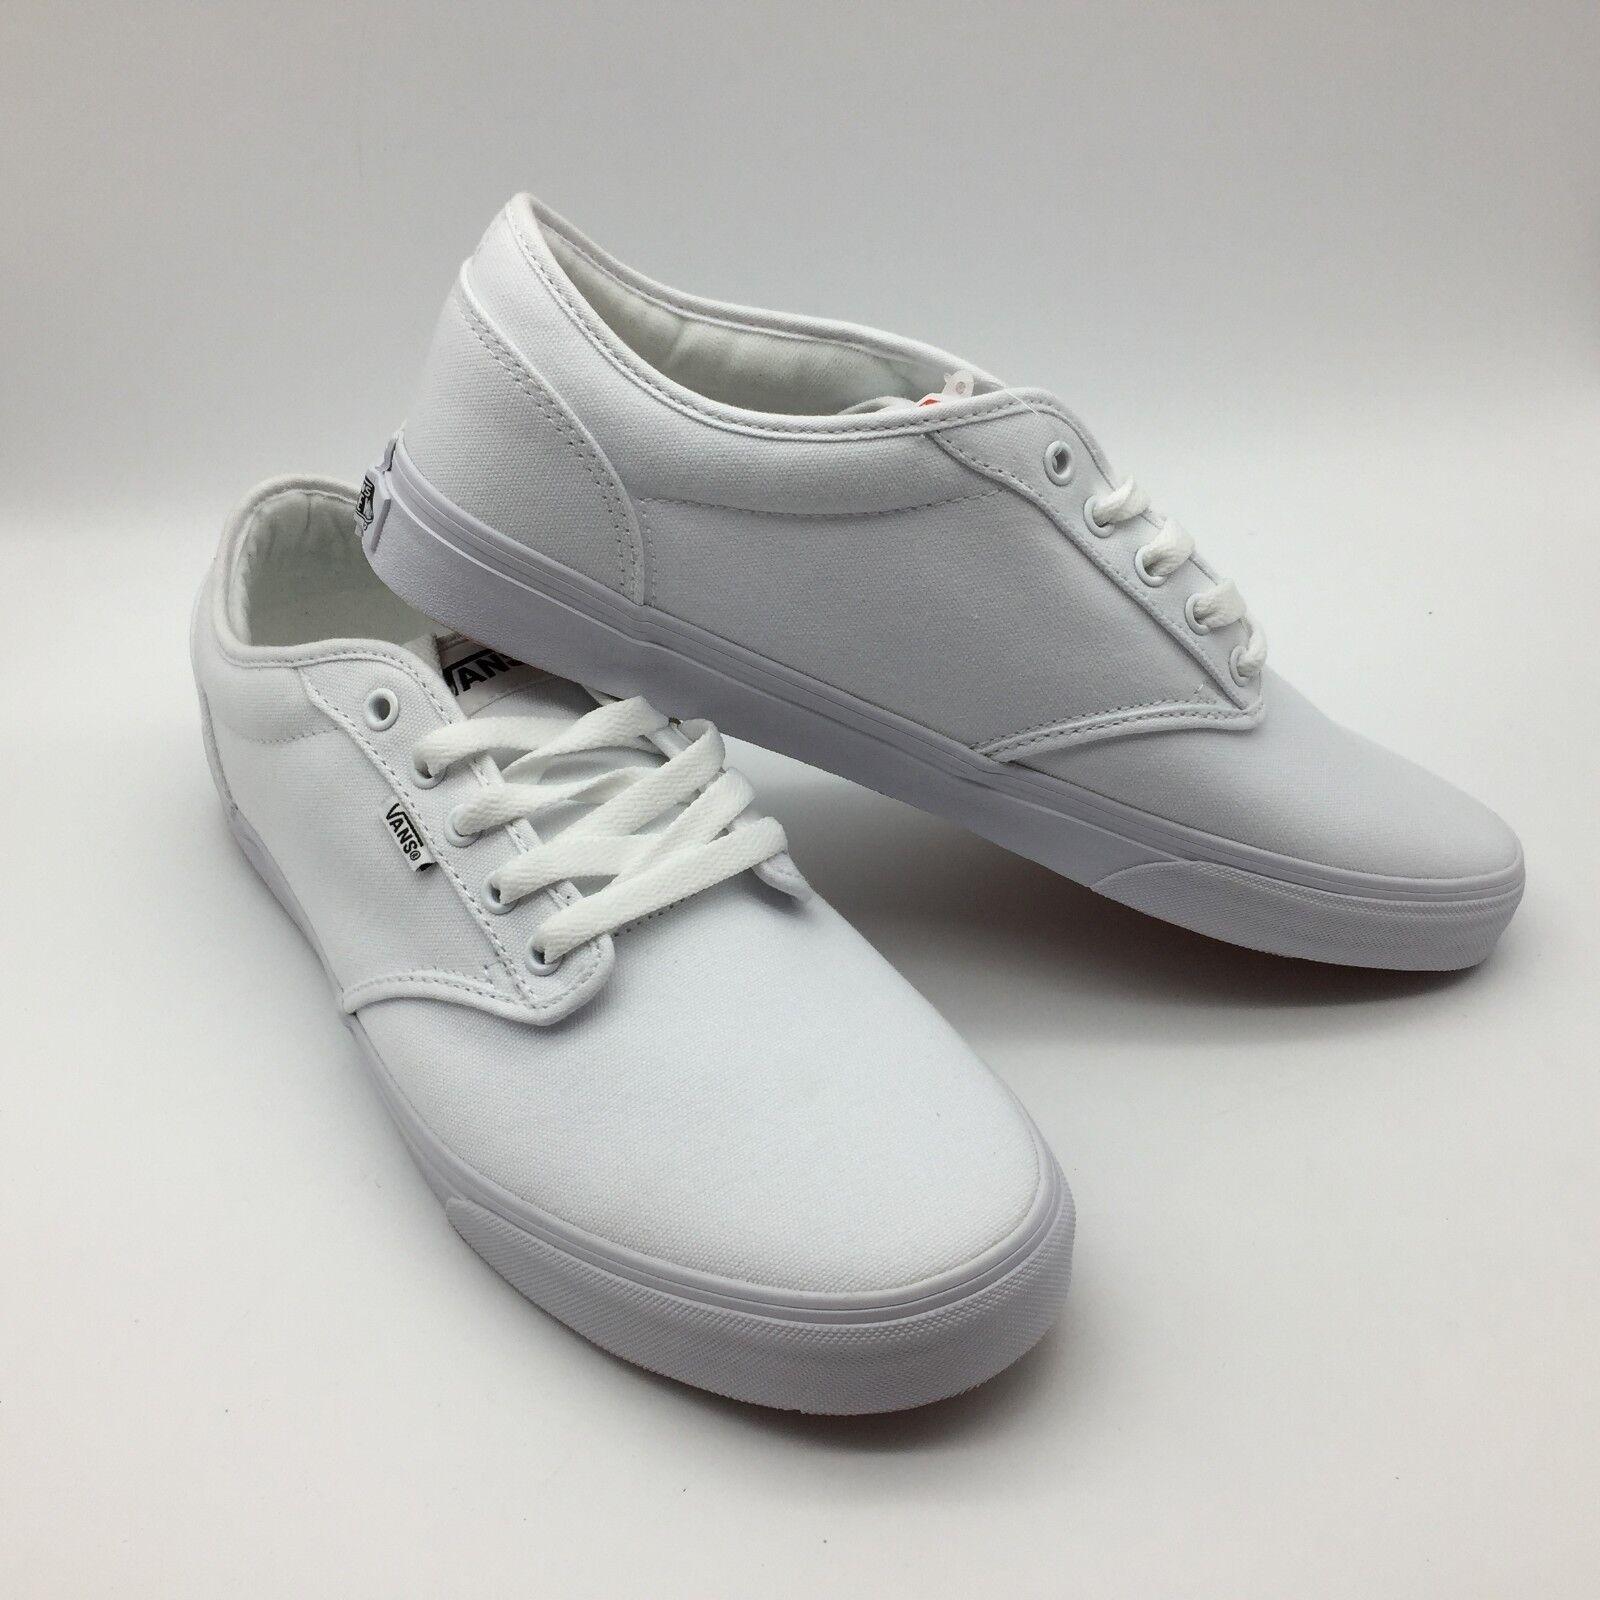 Vans Men Women's shoes's  Atwood  (Canvas) White white